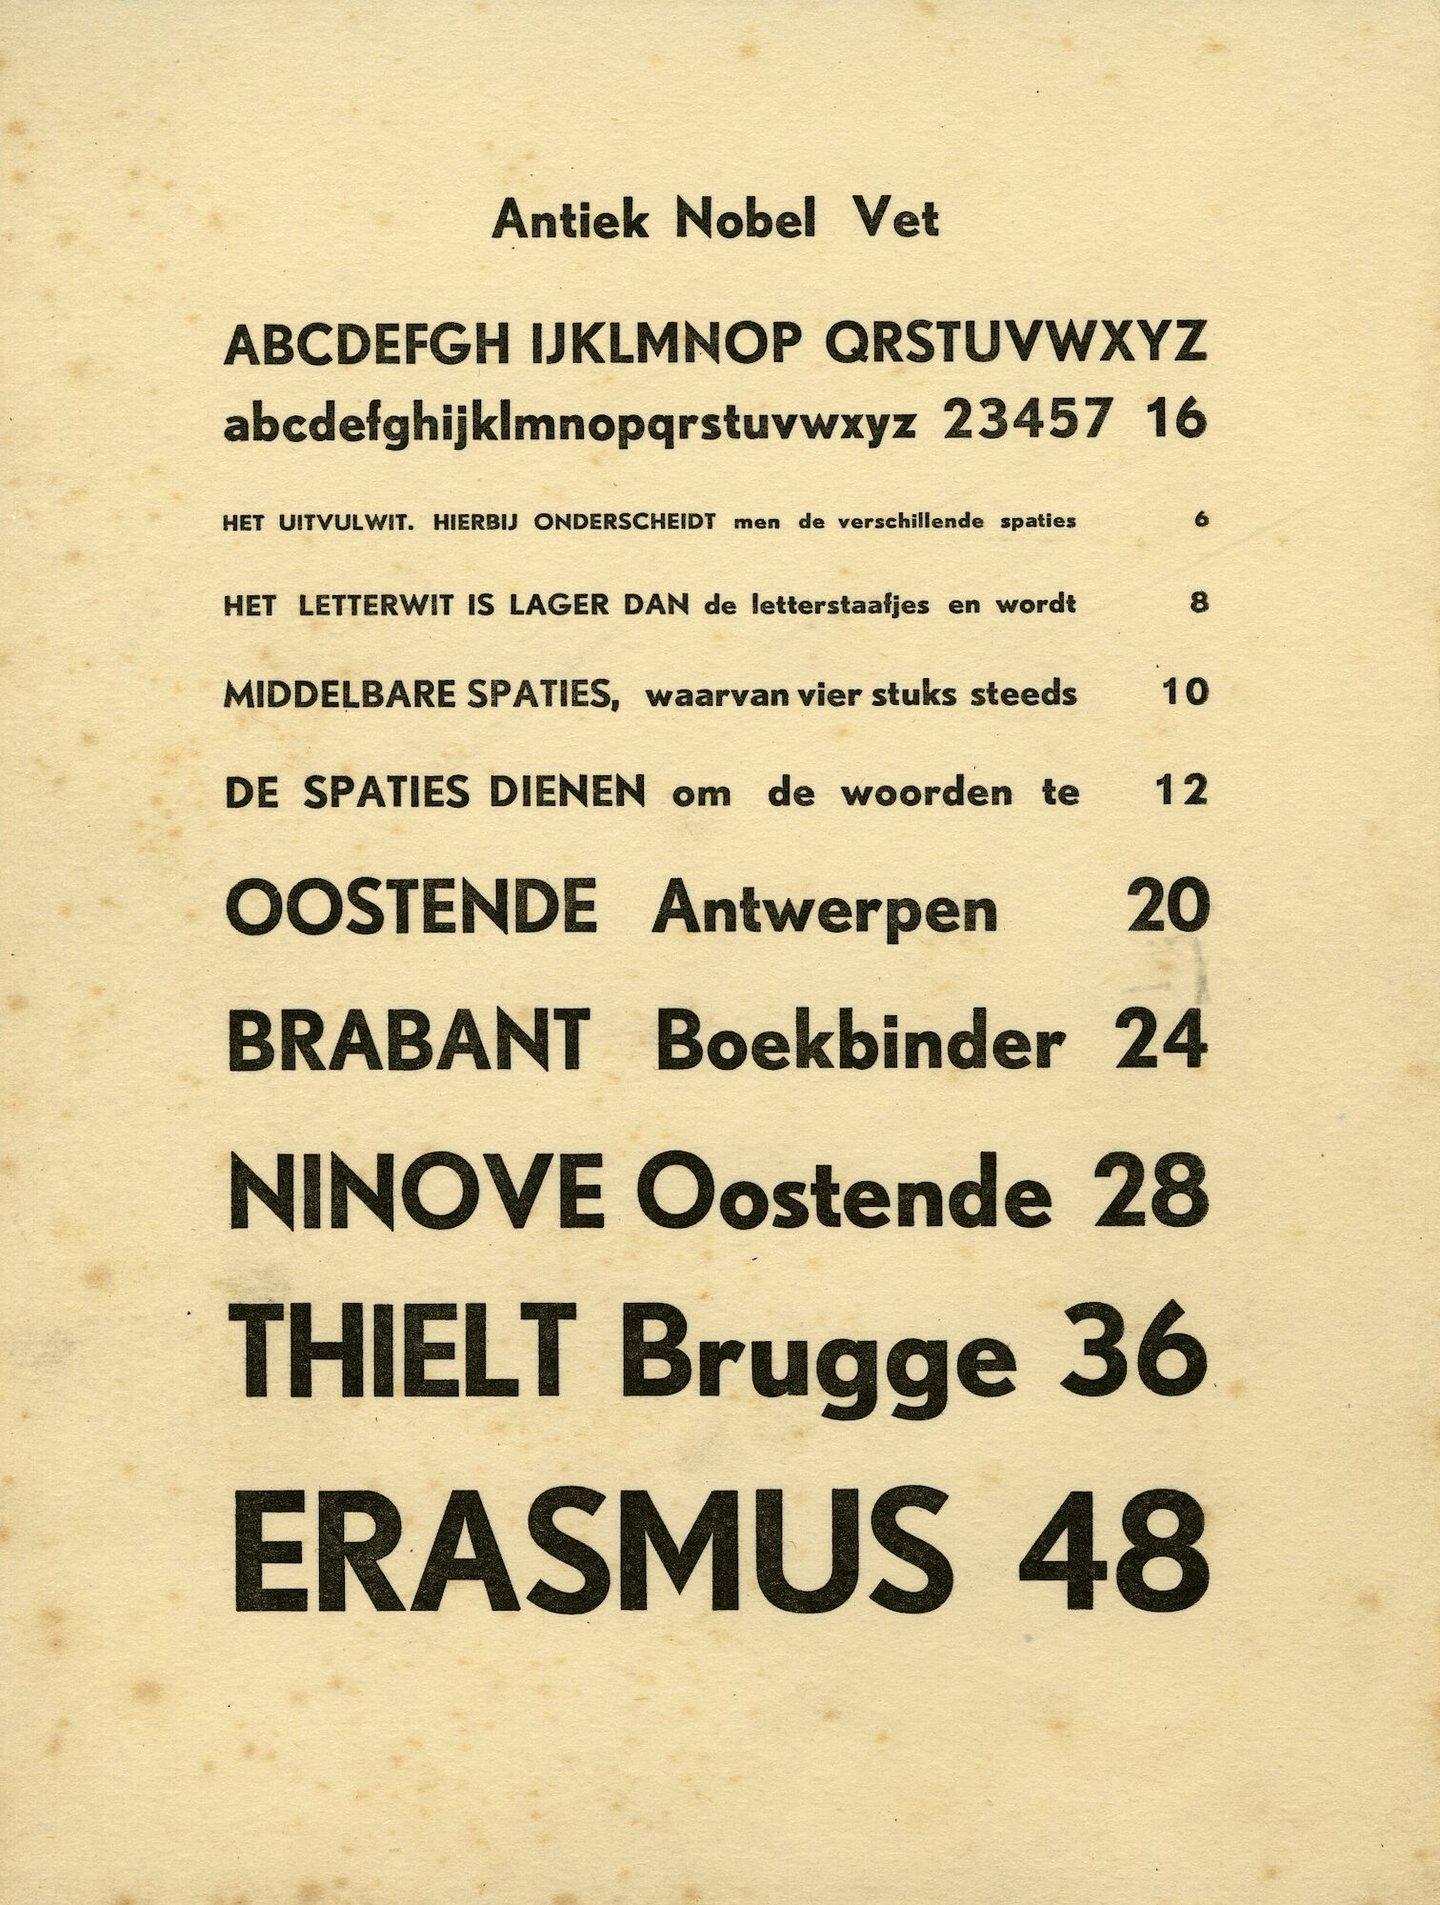 Letterproef van het lettertype Antiek Nobel Vet